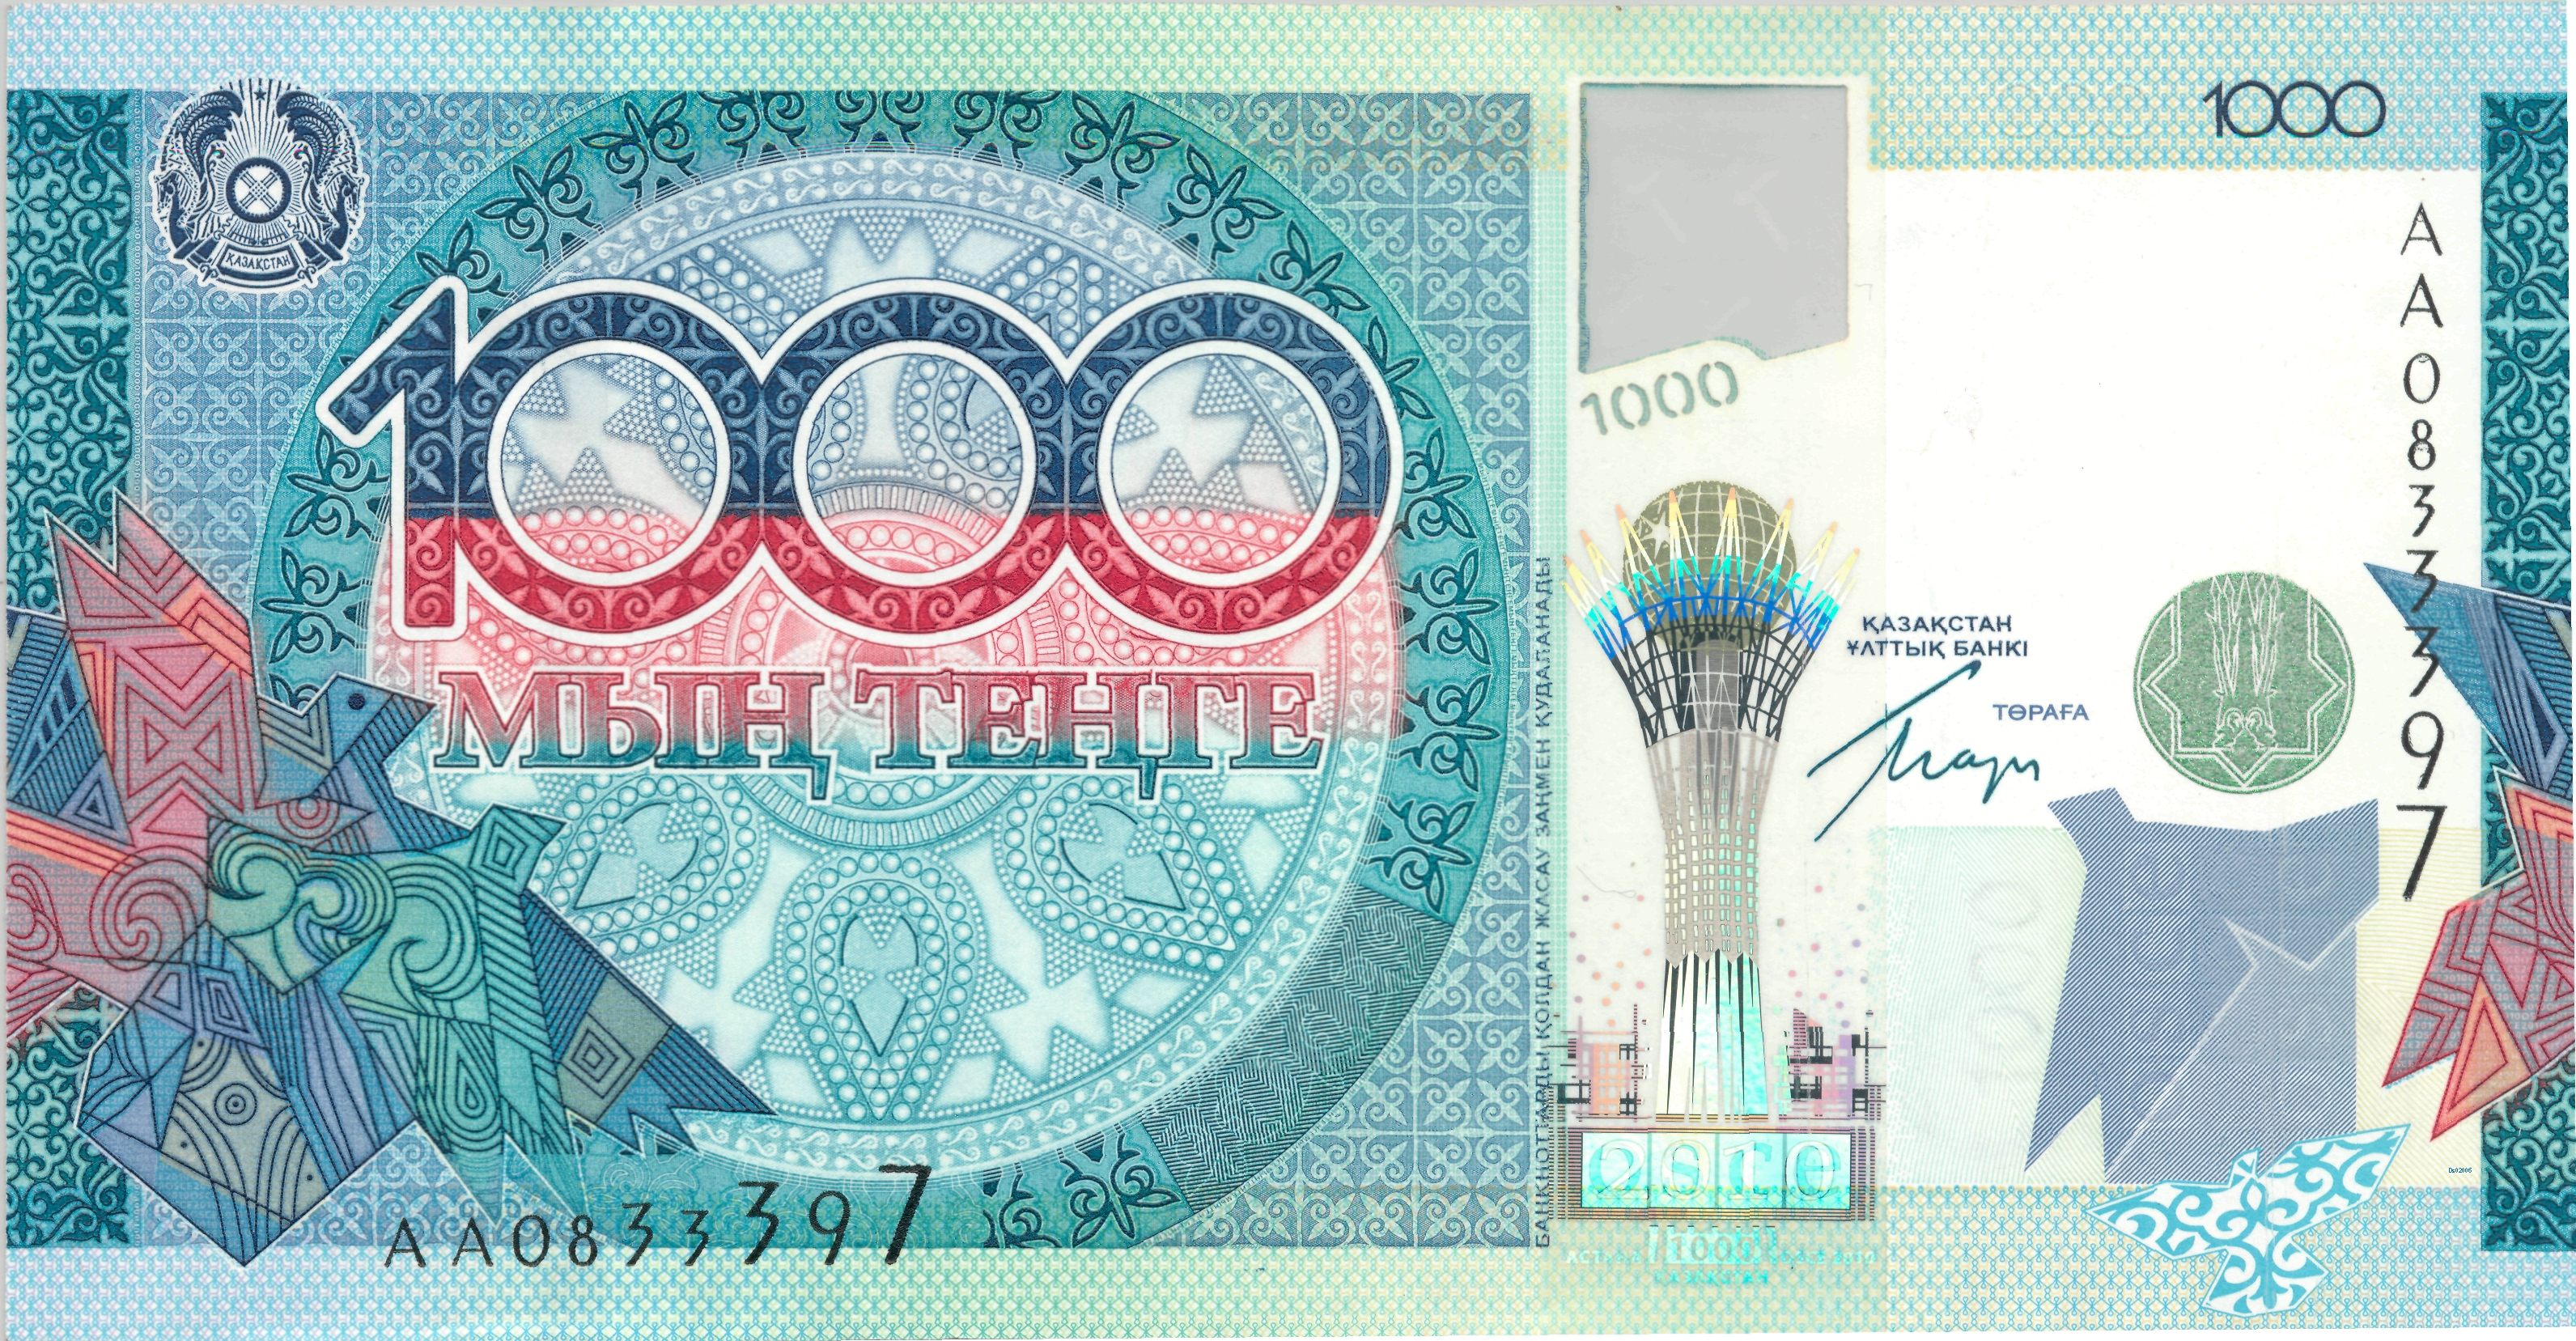 Kazakhstan-2010-Bill-1000-Obverse.jpg